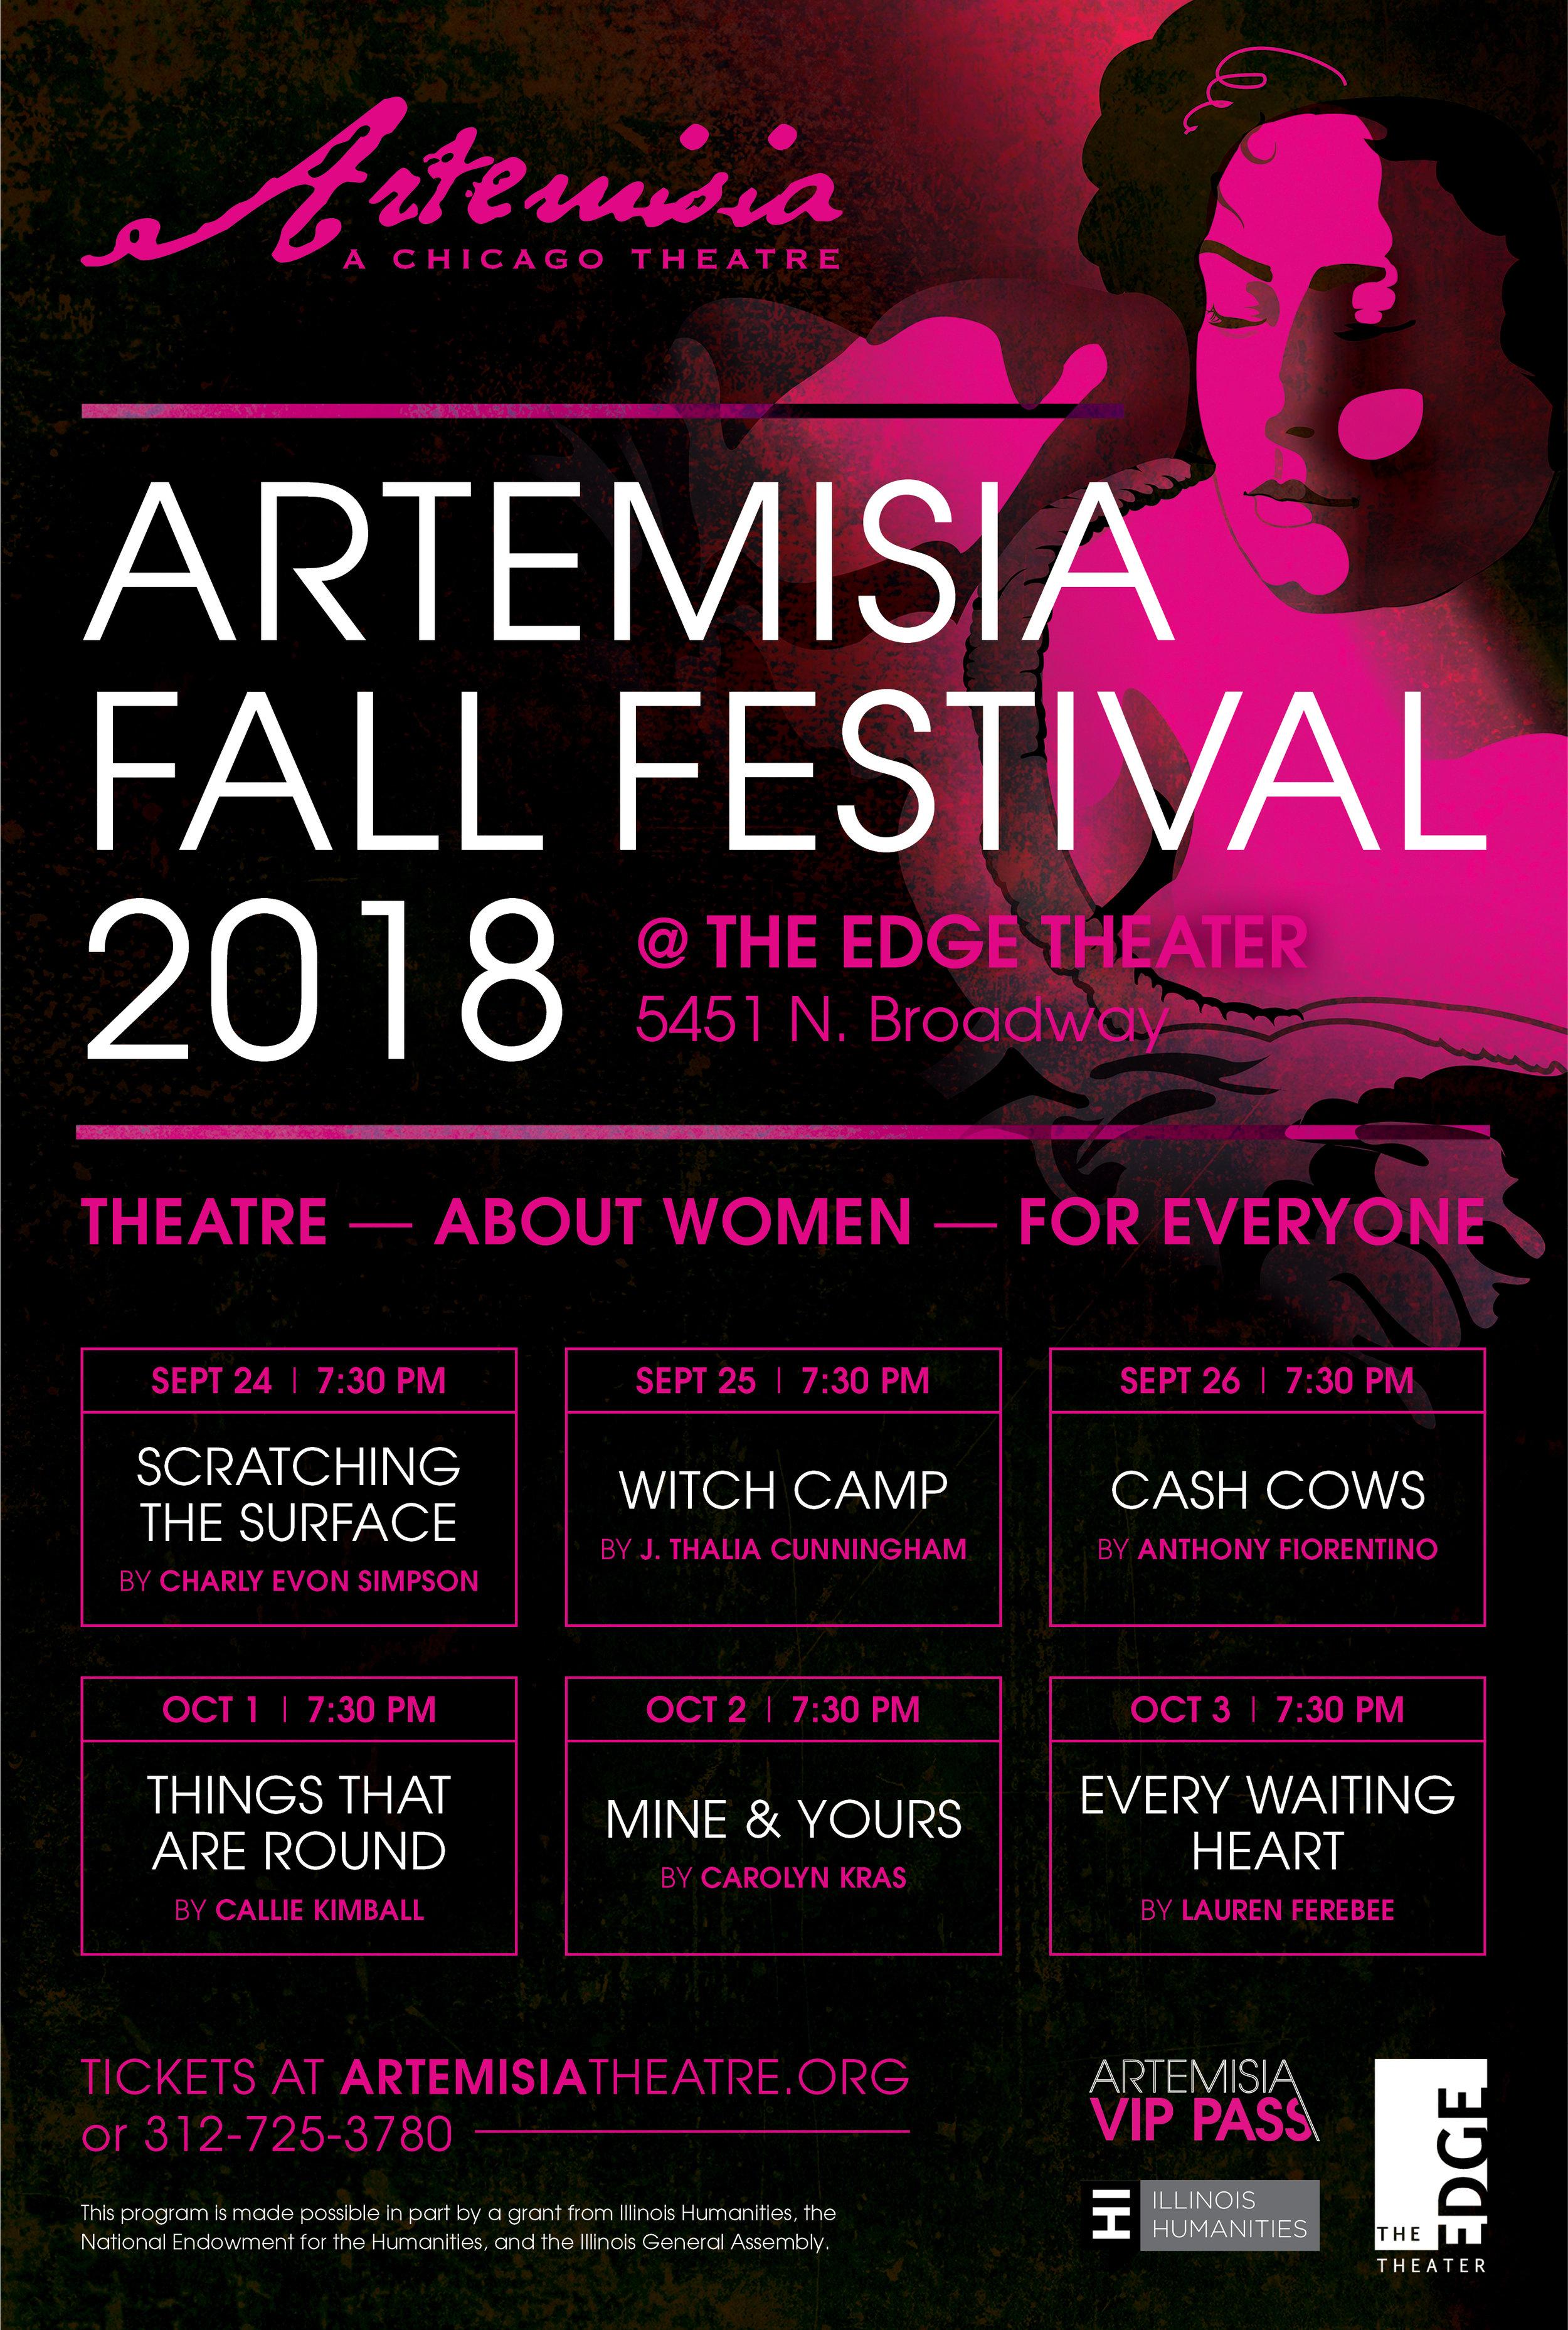 Artemisia_FallFest2018_WebInvite.jpg